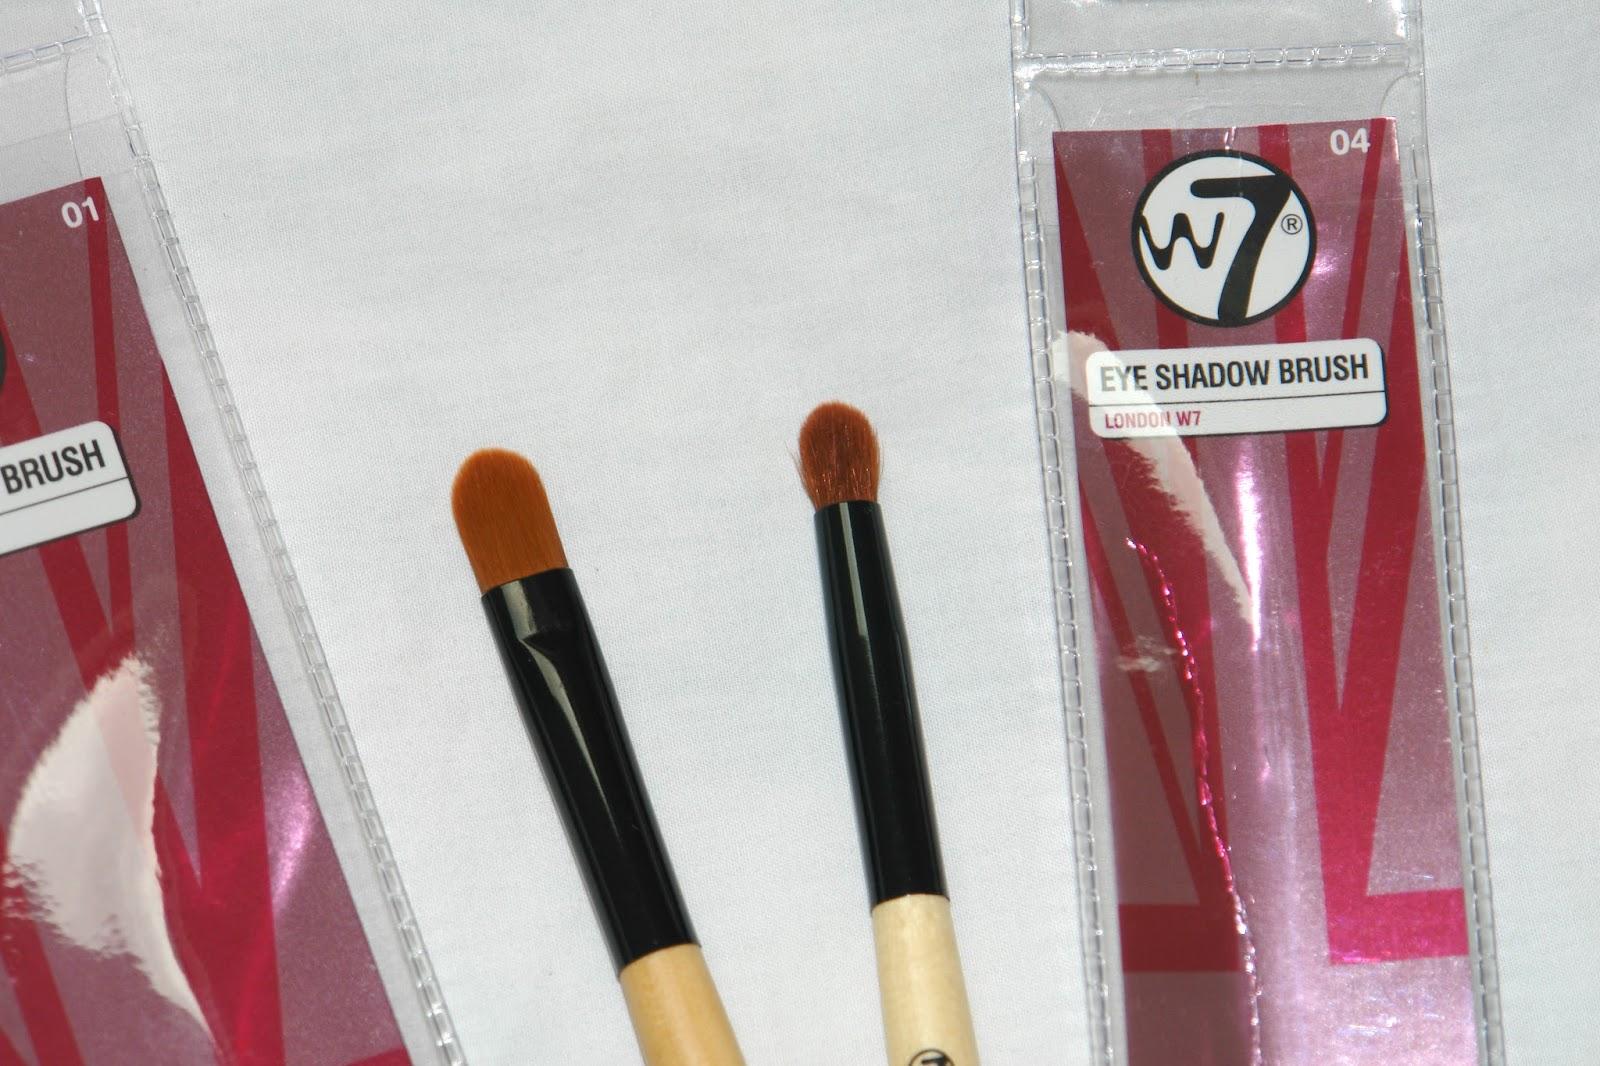 W7 Eyeshadow Brushes, W7 01 Eyeshadow Brush, W7 04 Eyeshadow Brush, beauty, brushes, make up, review, W7, fragrance direct, eyeshadow brushes, cheap make up brushes, MAC 217 Blending Brush dupe